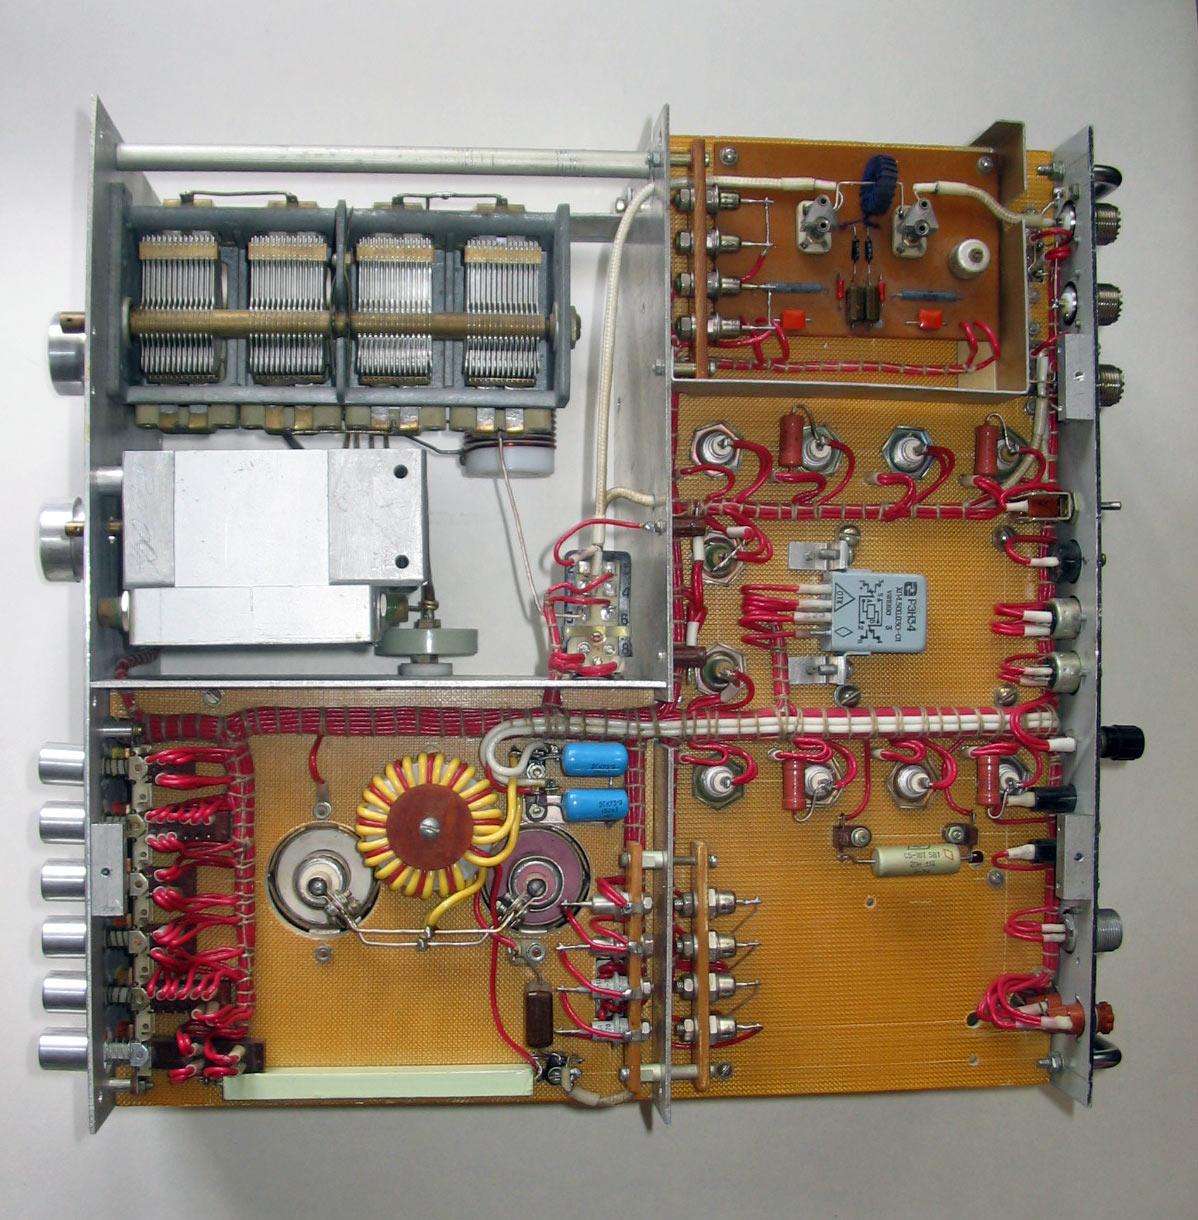 Усилитель мощности на лампе ГМИ-11 - Усилители мощности ВЧ ...